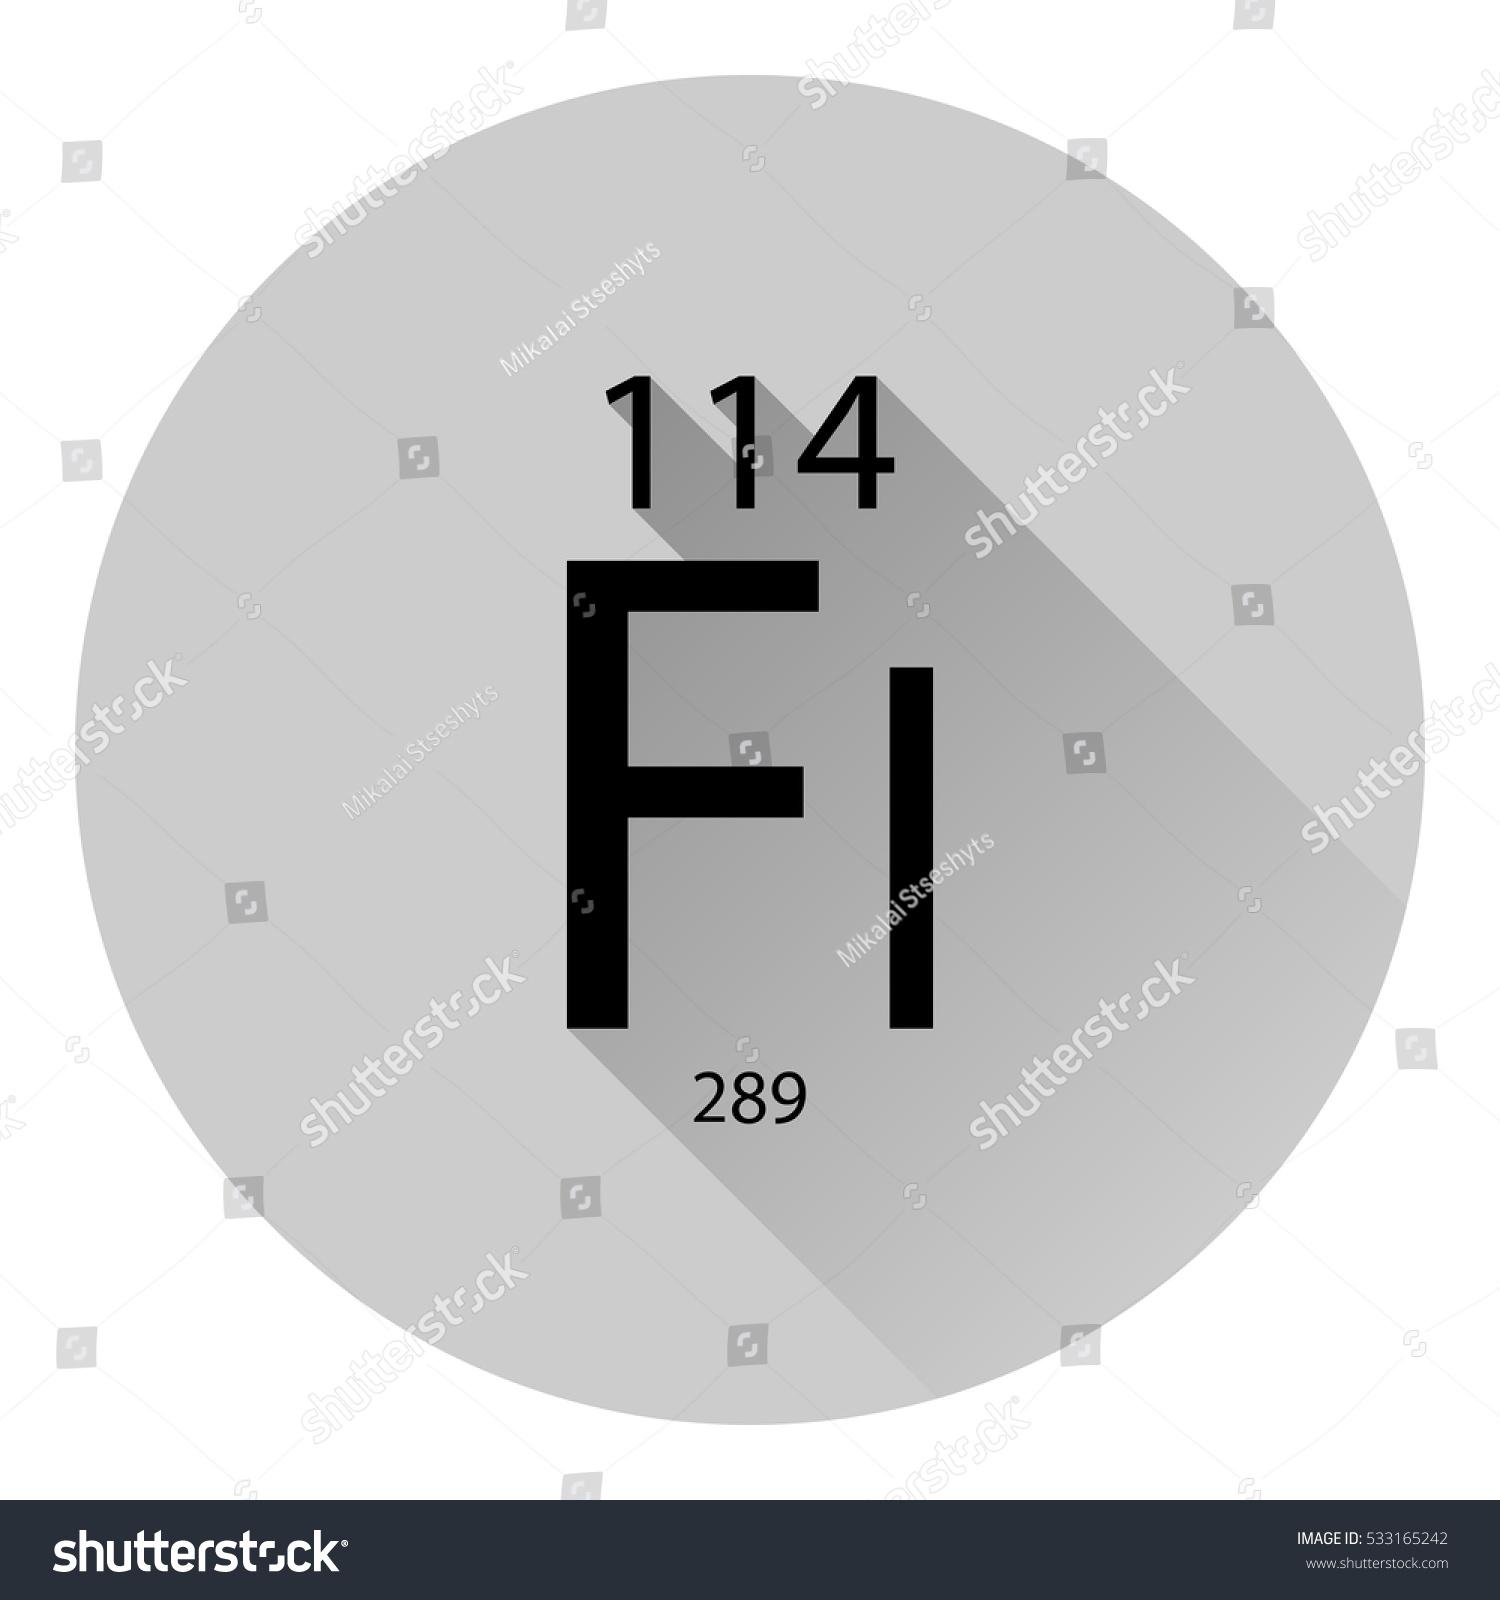 Periodic table element flerovium basic properties stock vector the periodic table element flerovium with the basic properties flat style with long shadow gamestrikefo Gallery